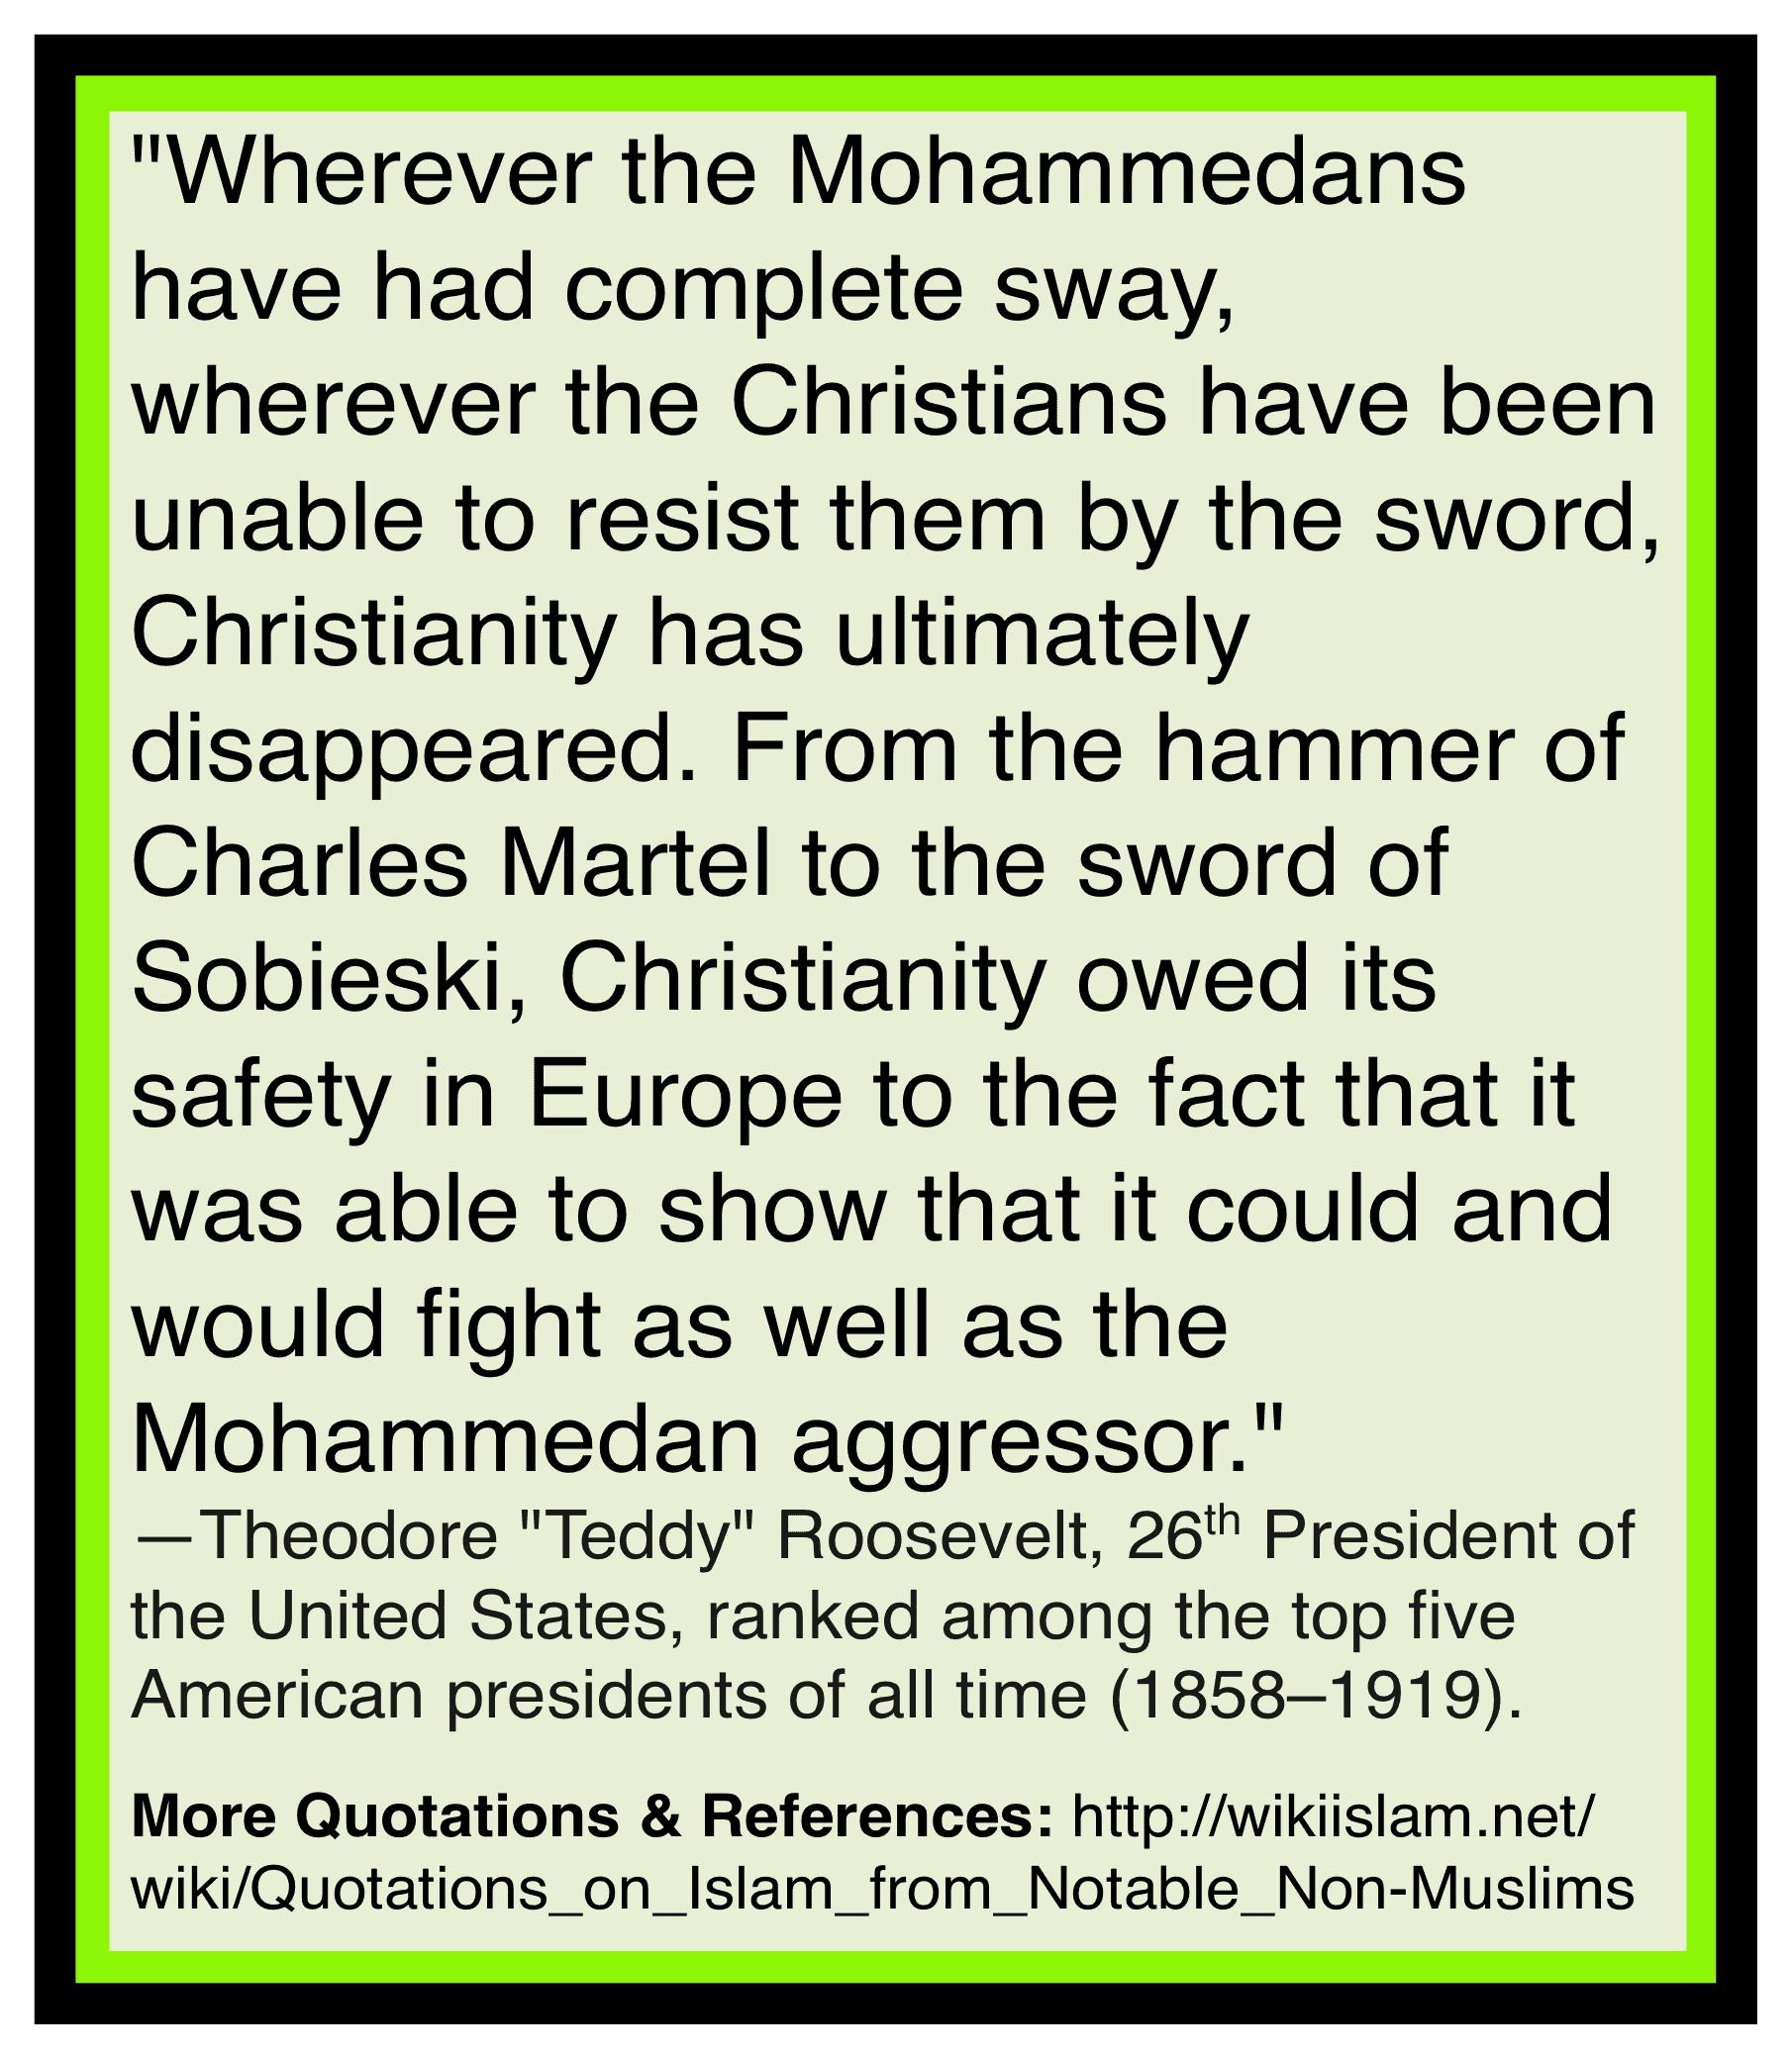 Islam murders Christians